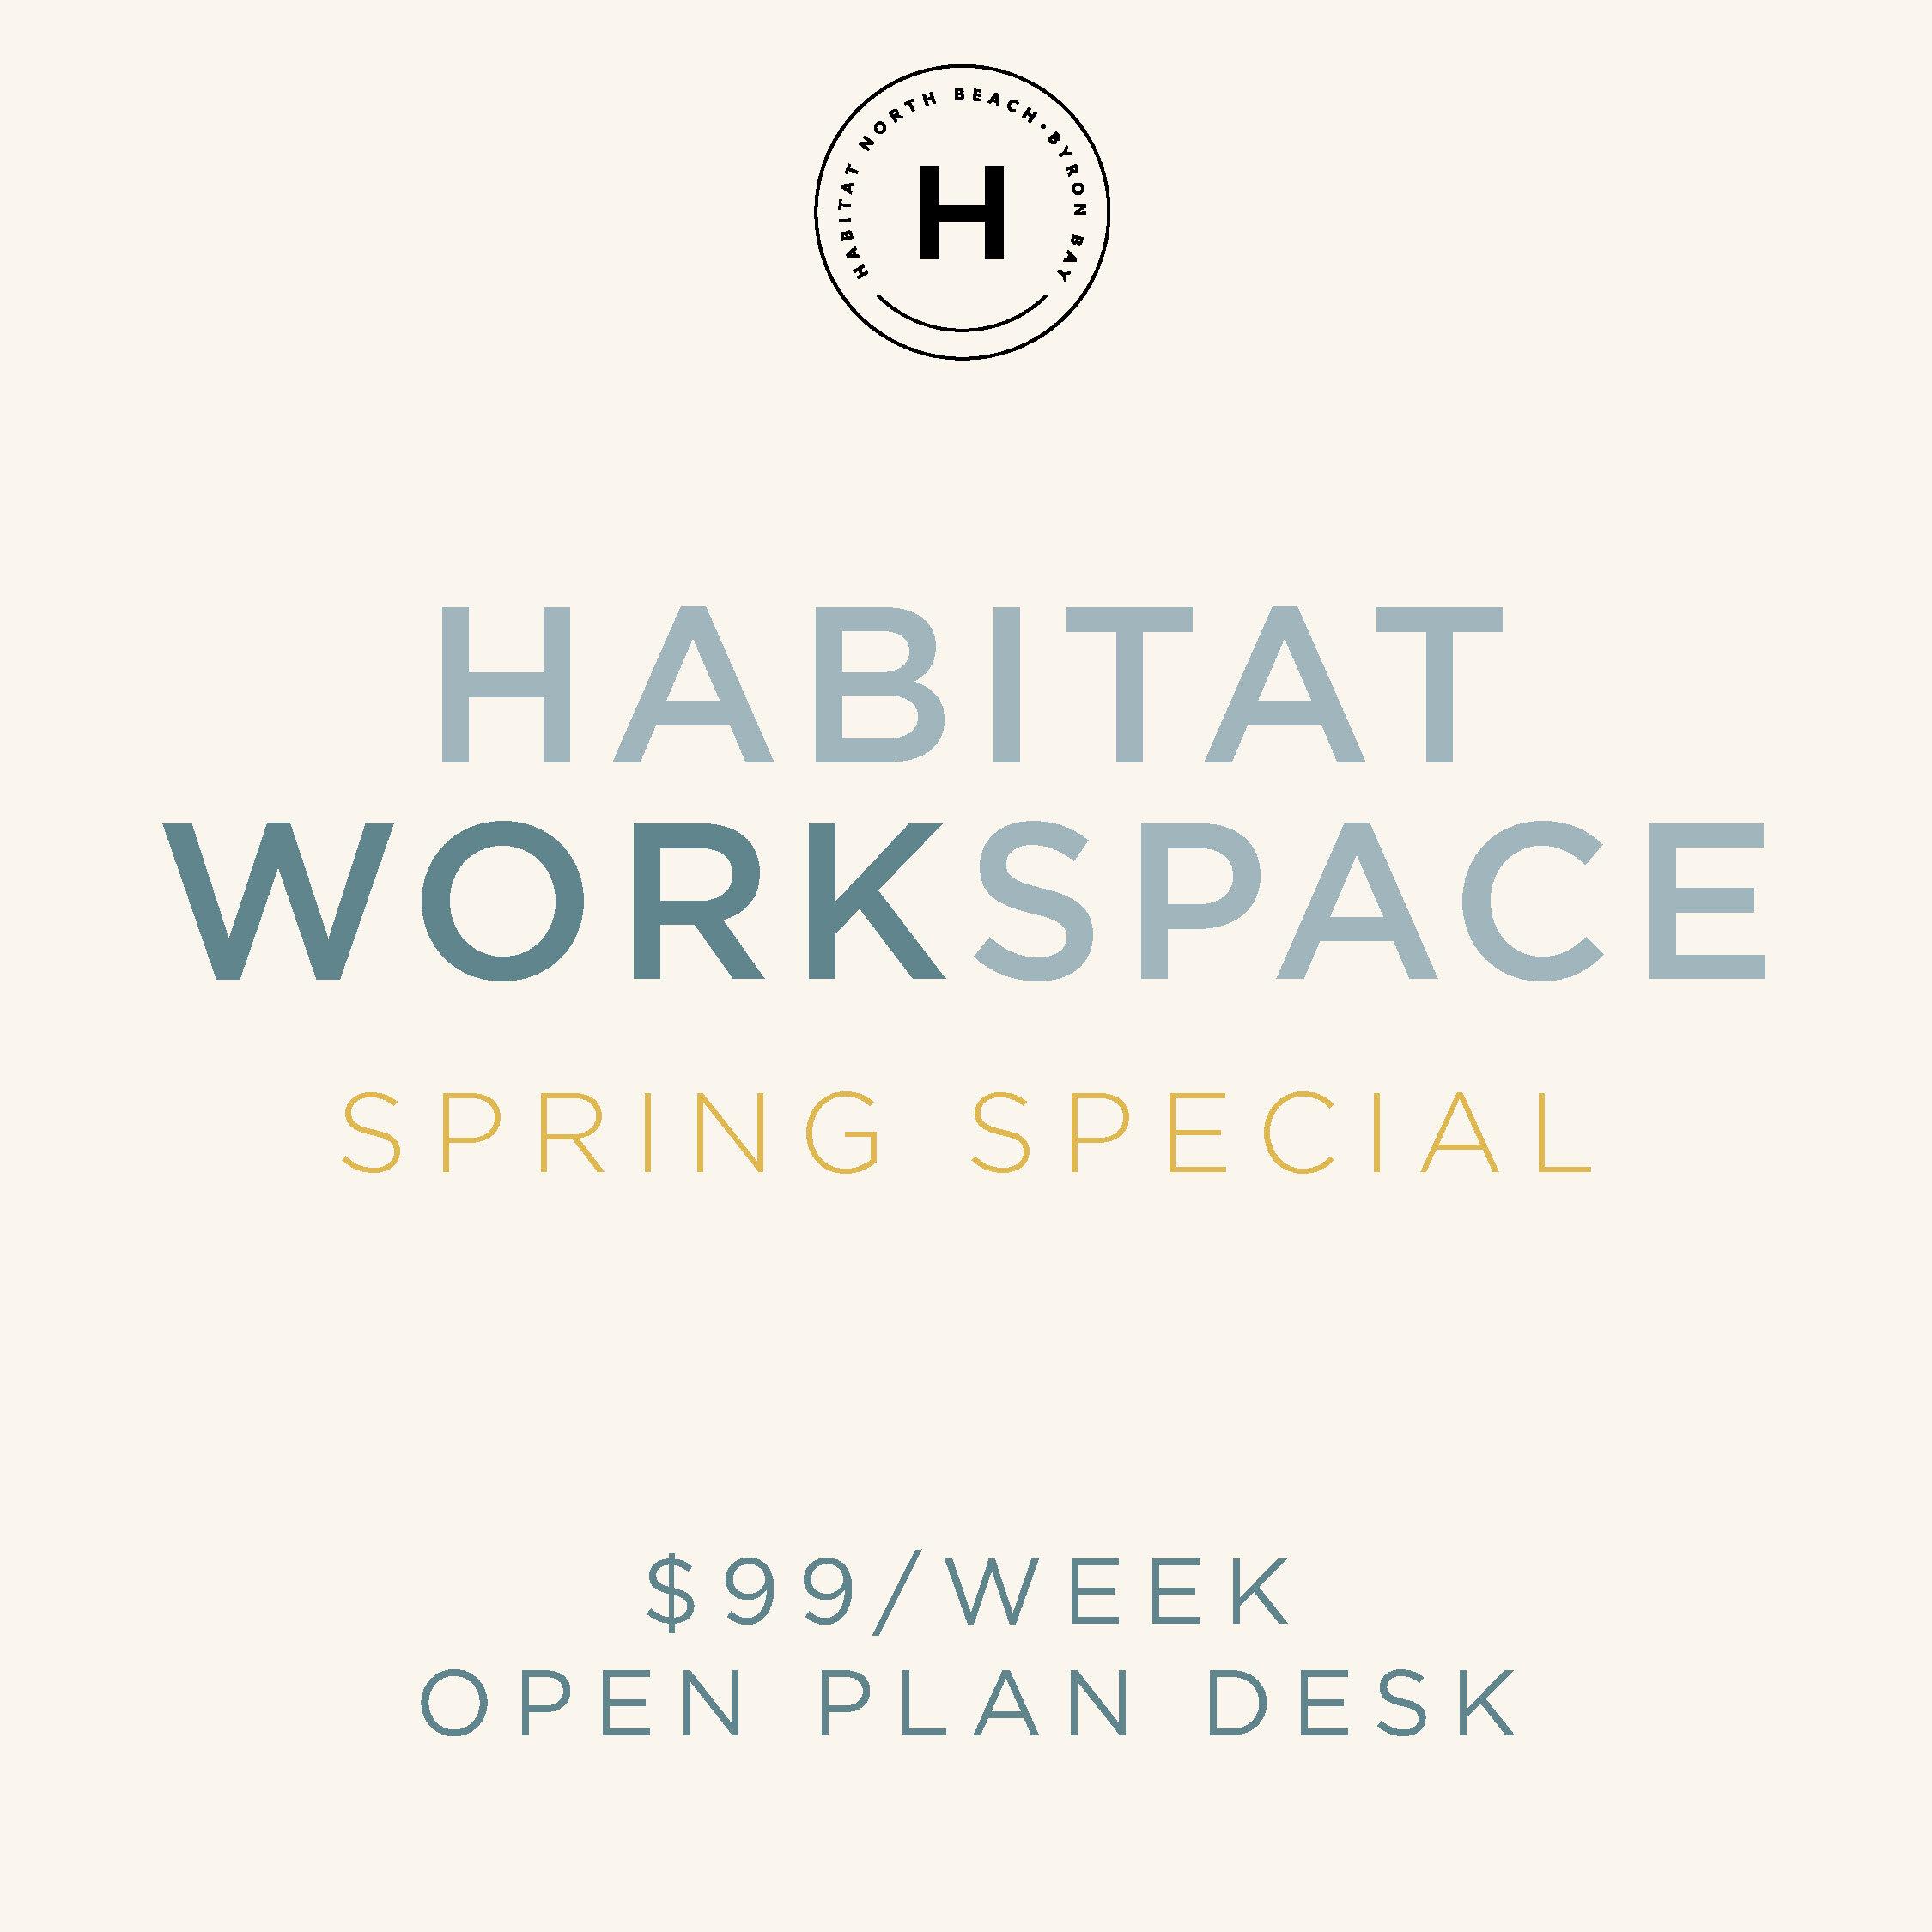 spring special habitat workspace